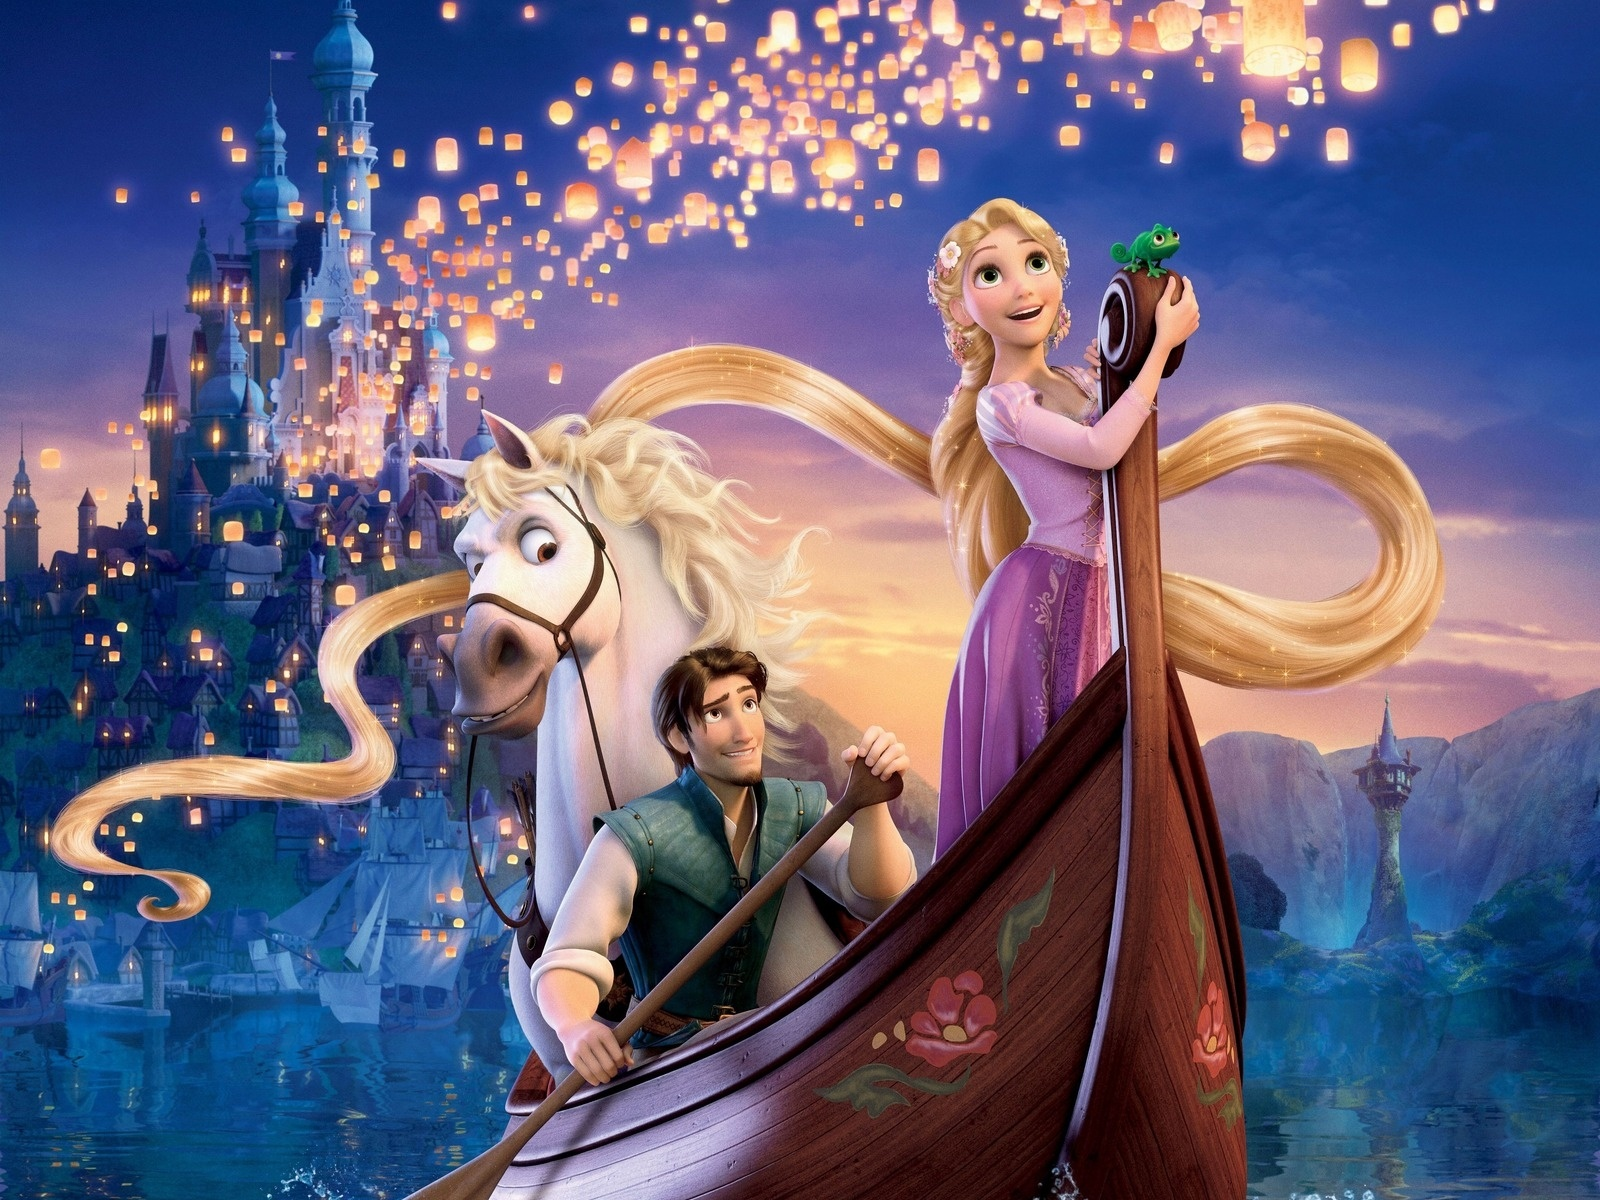 Princesa Rapunzel de Disney